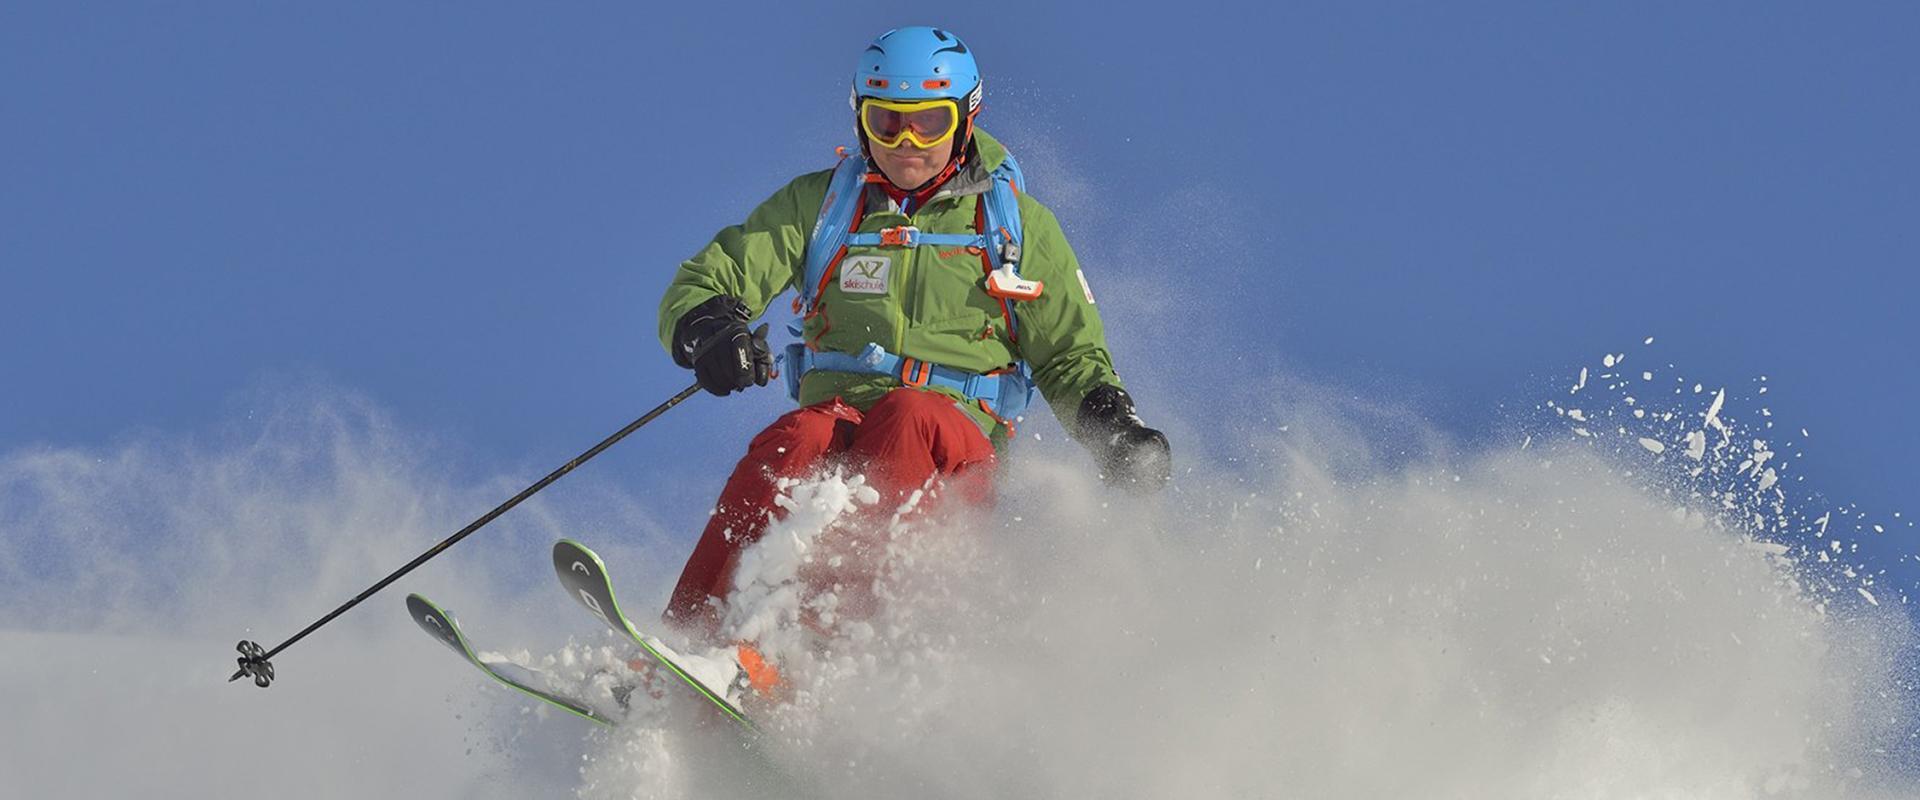 Viel Spaß am Arlberg